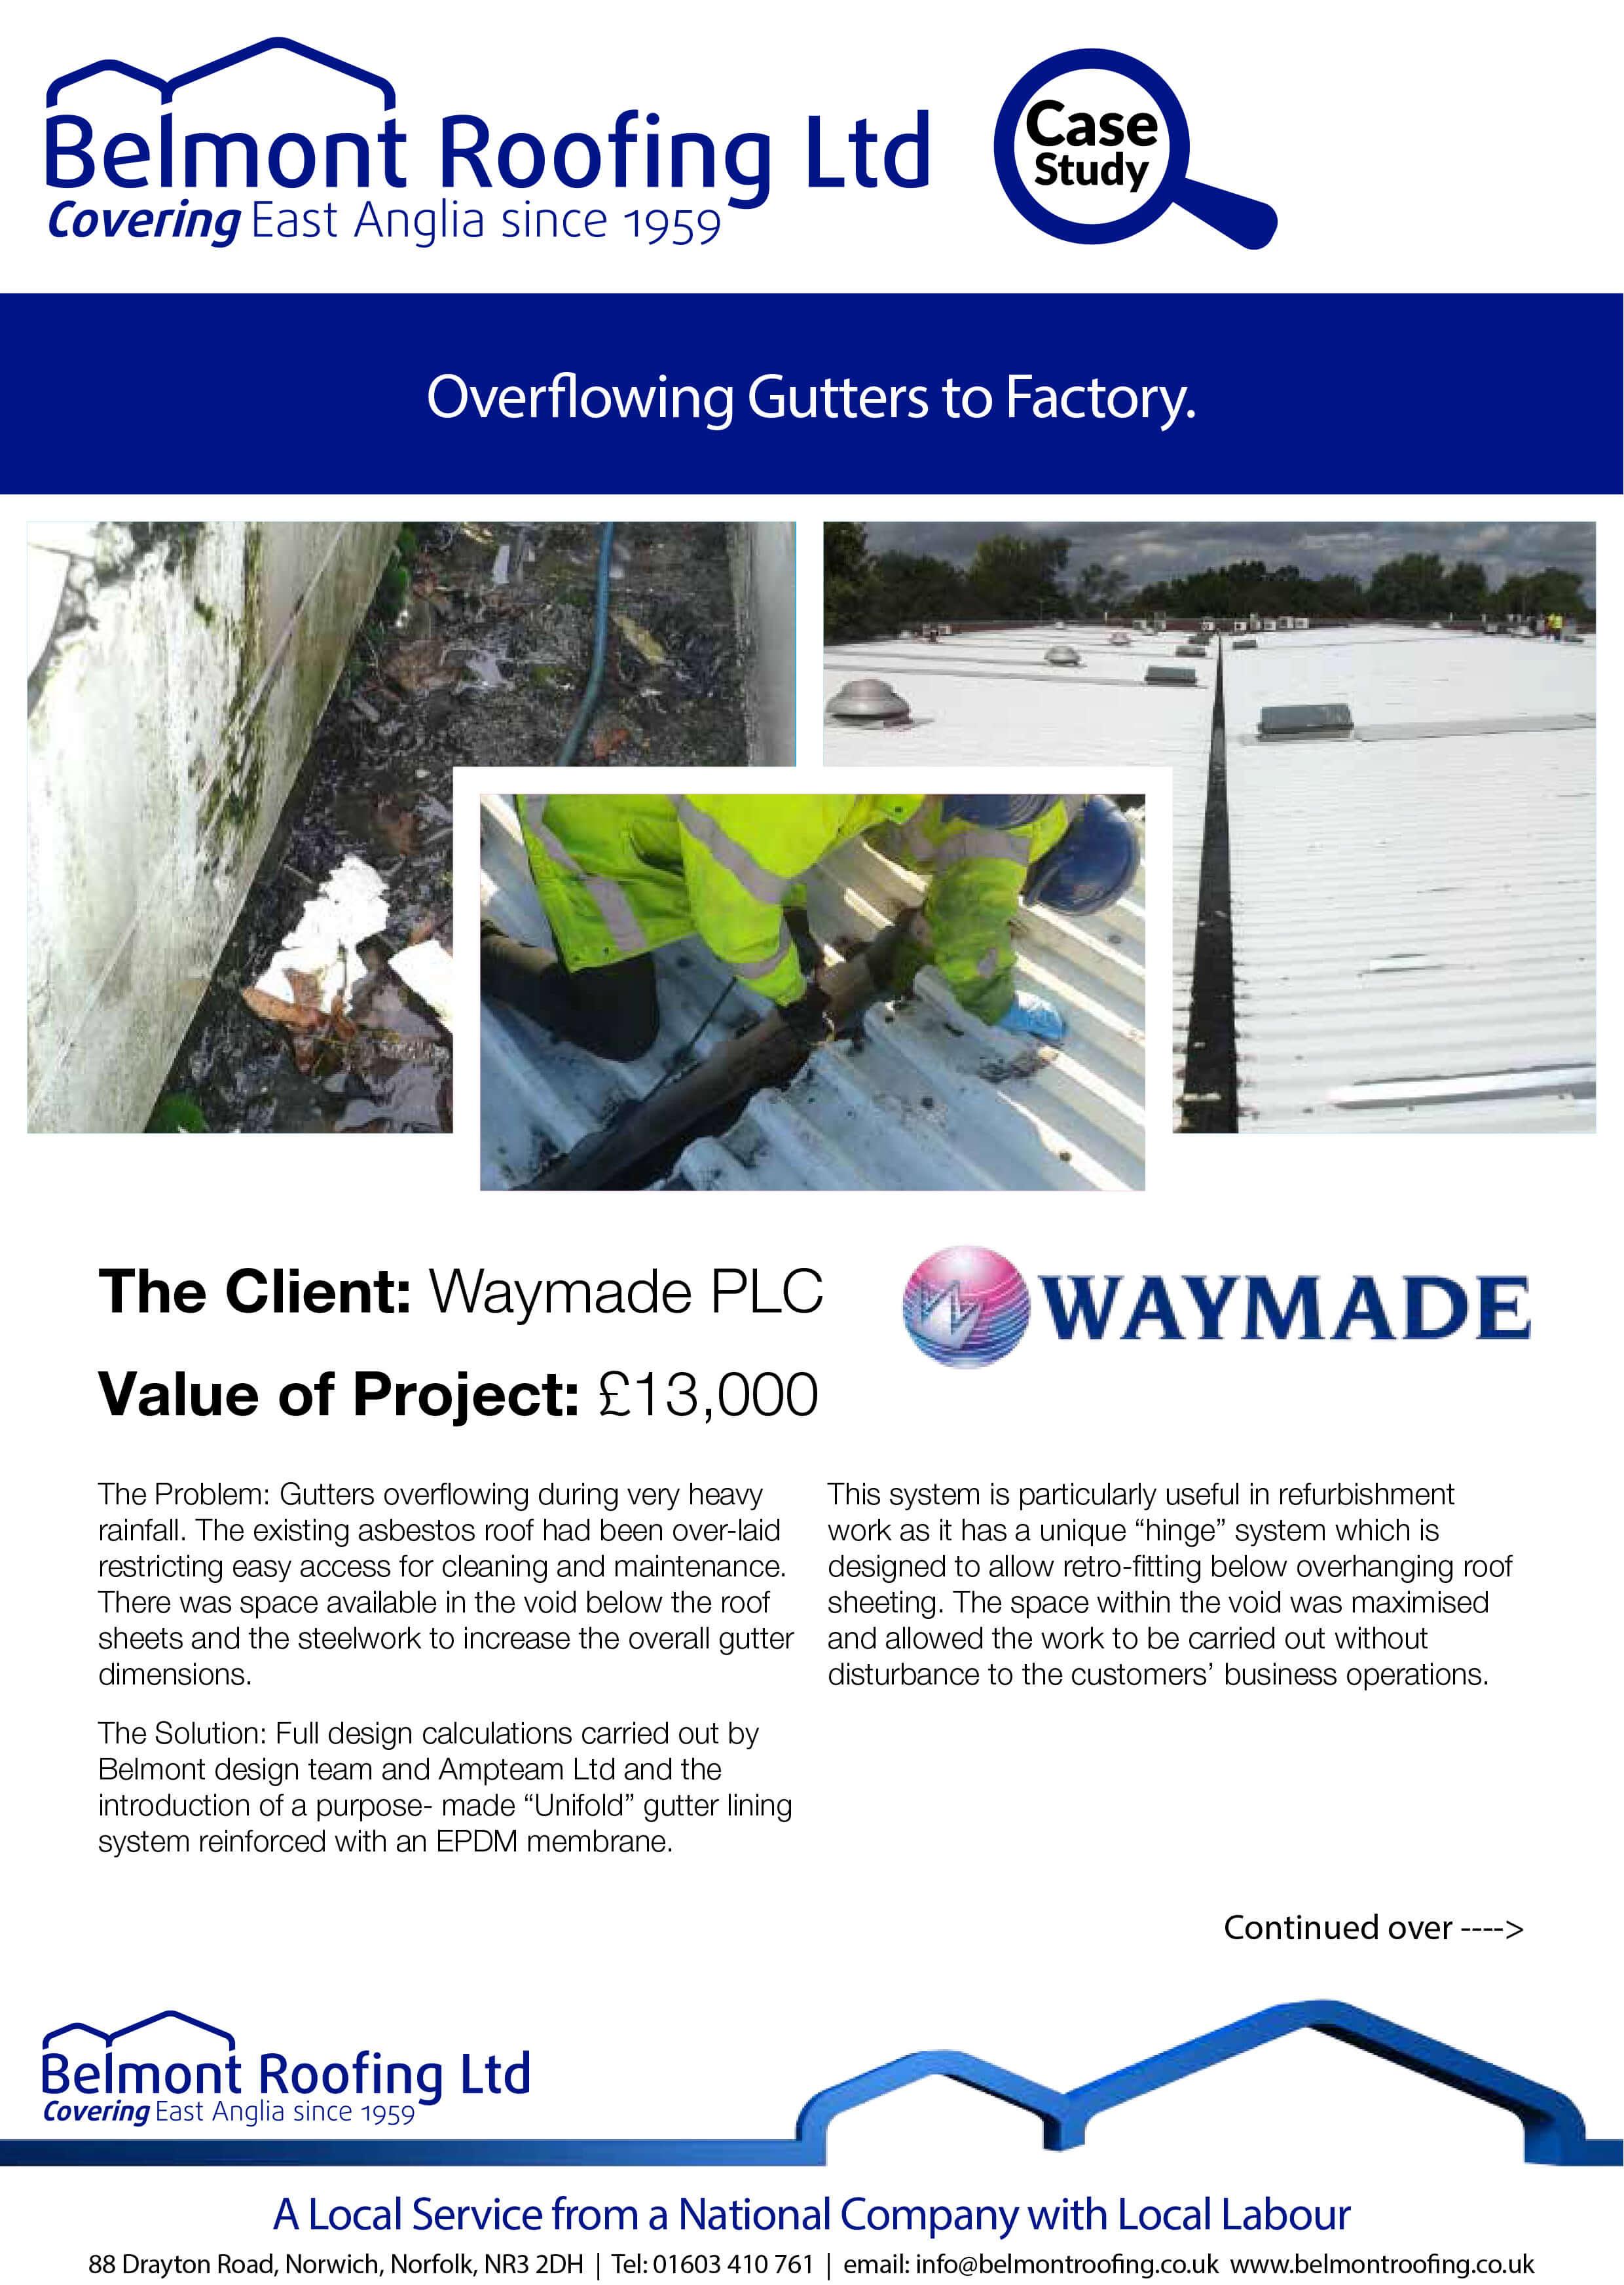 Overflowing Gutters Waymade